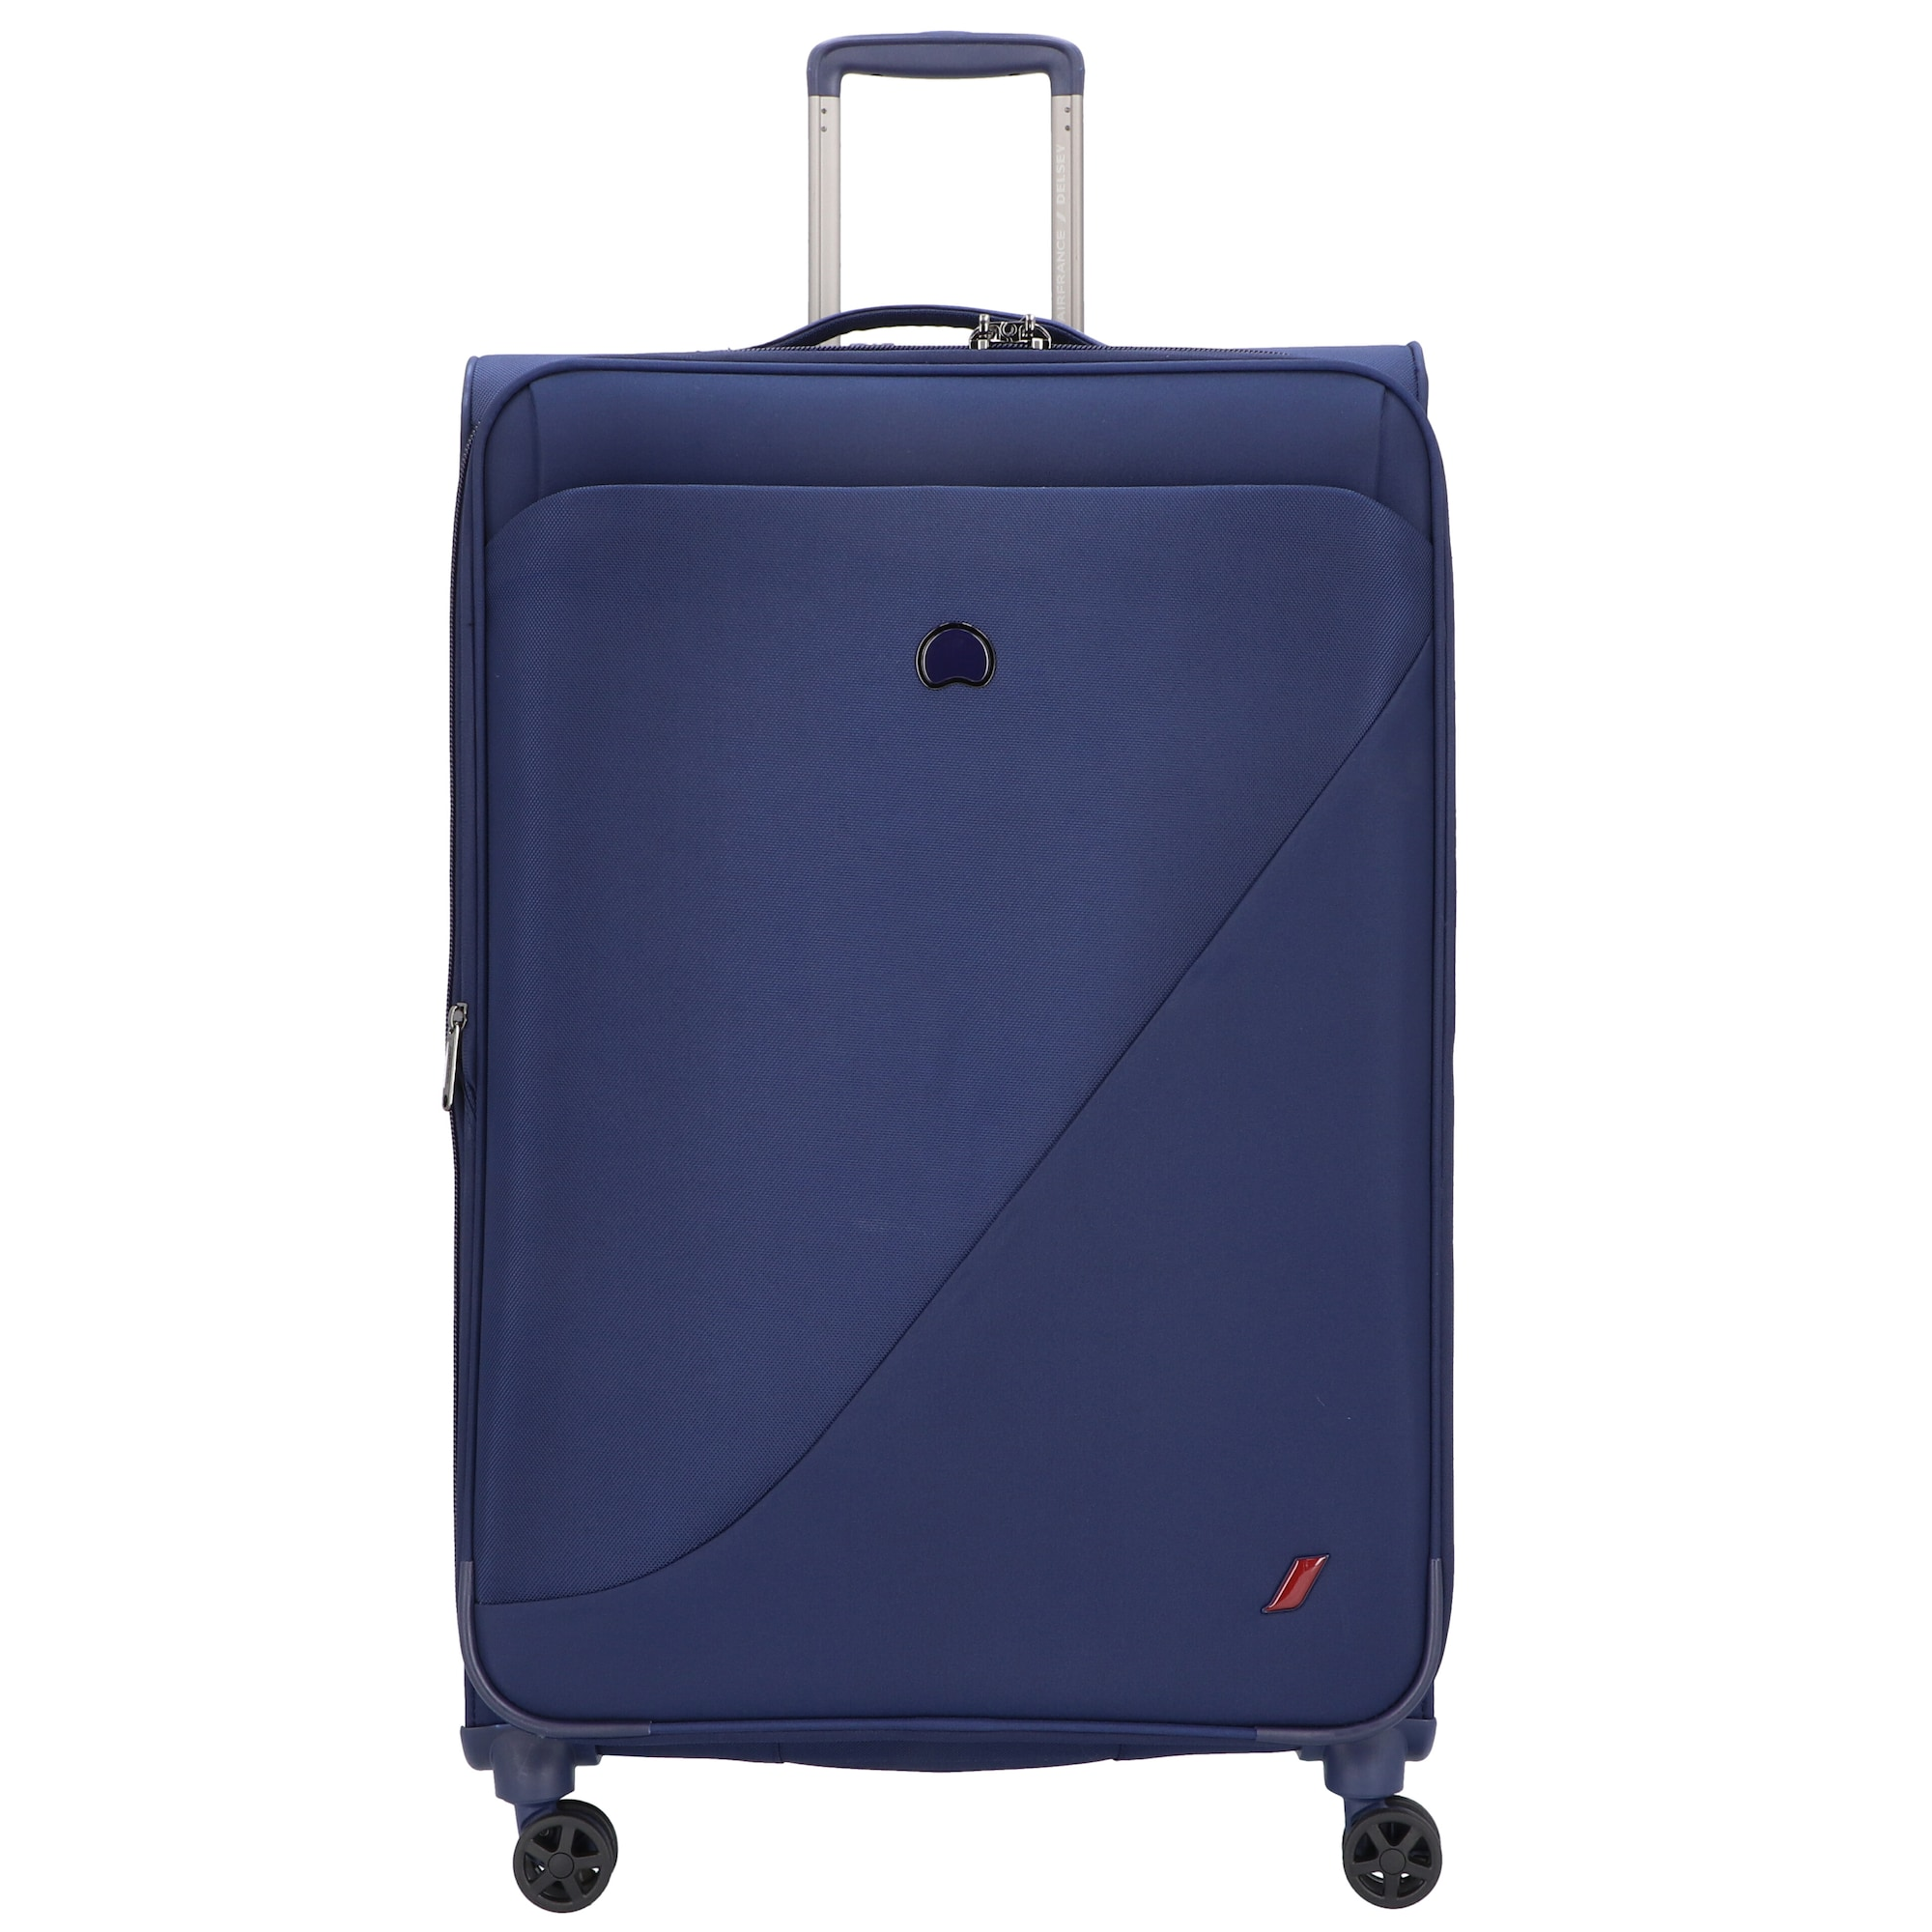 Trolley 'New Destination' | Taschen > Koffer & Trolleys > Trolleys | Delsey